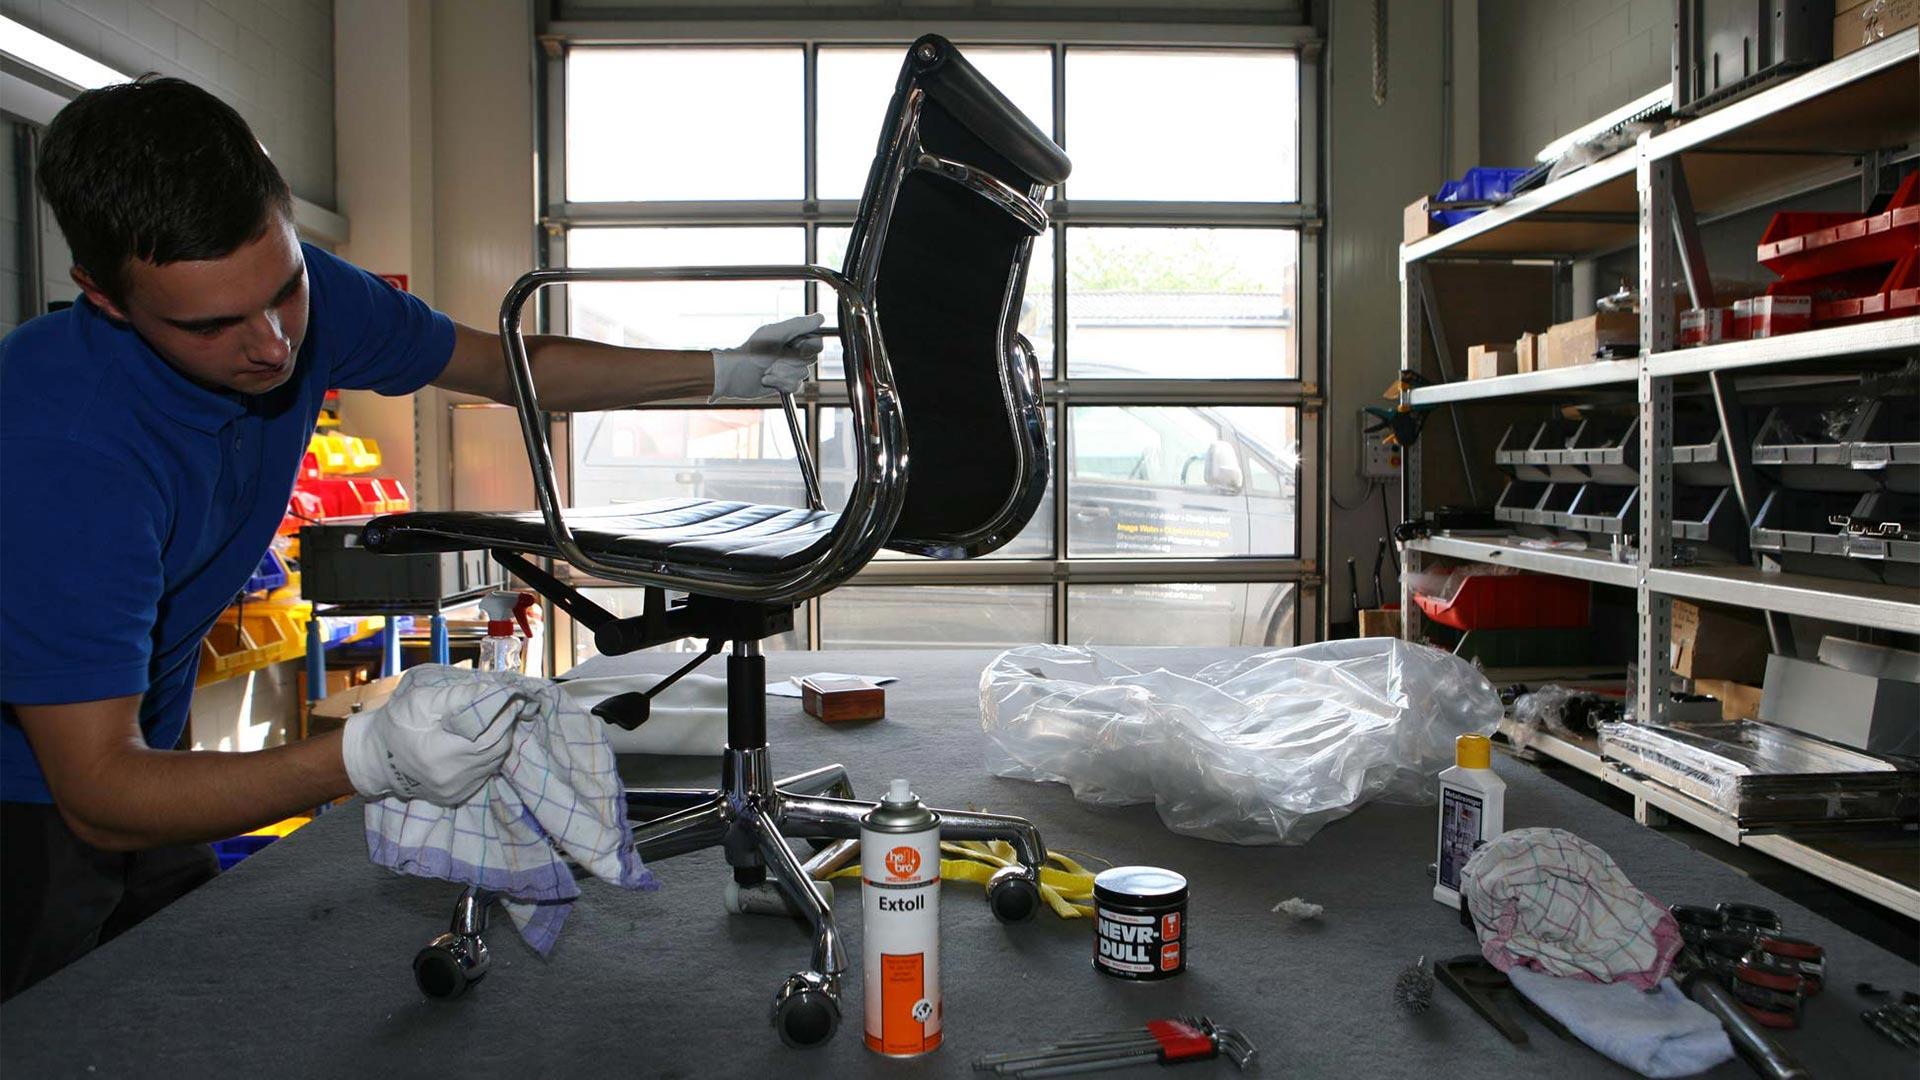 Vitra Ersatzteilservice + Reparatur Eames alu Chair in Berlin bei steidten+09